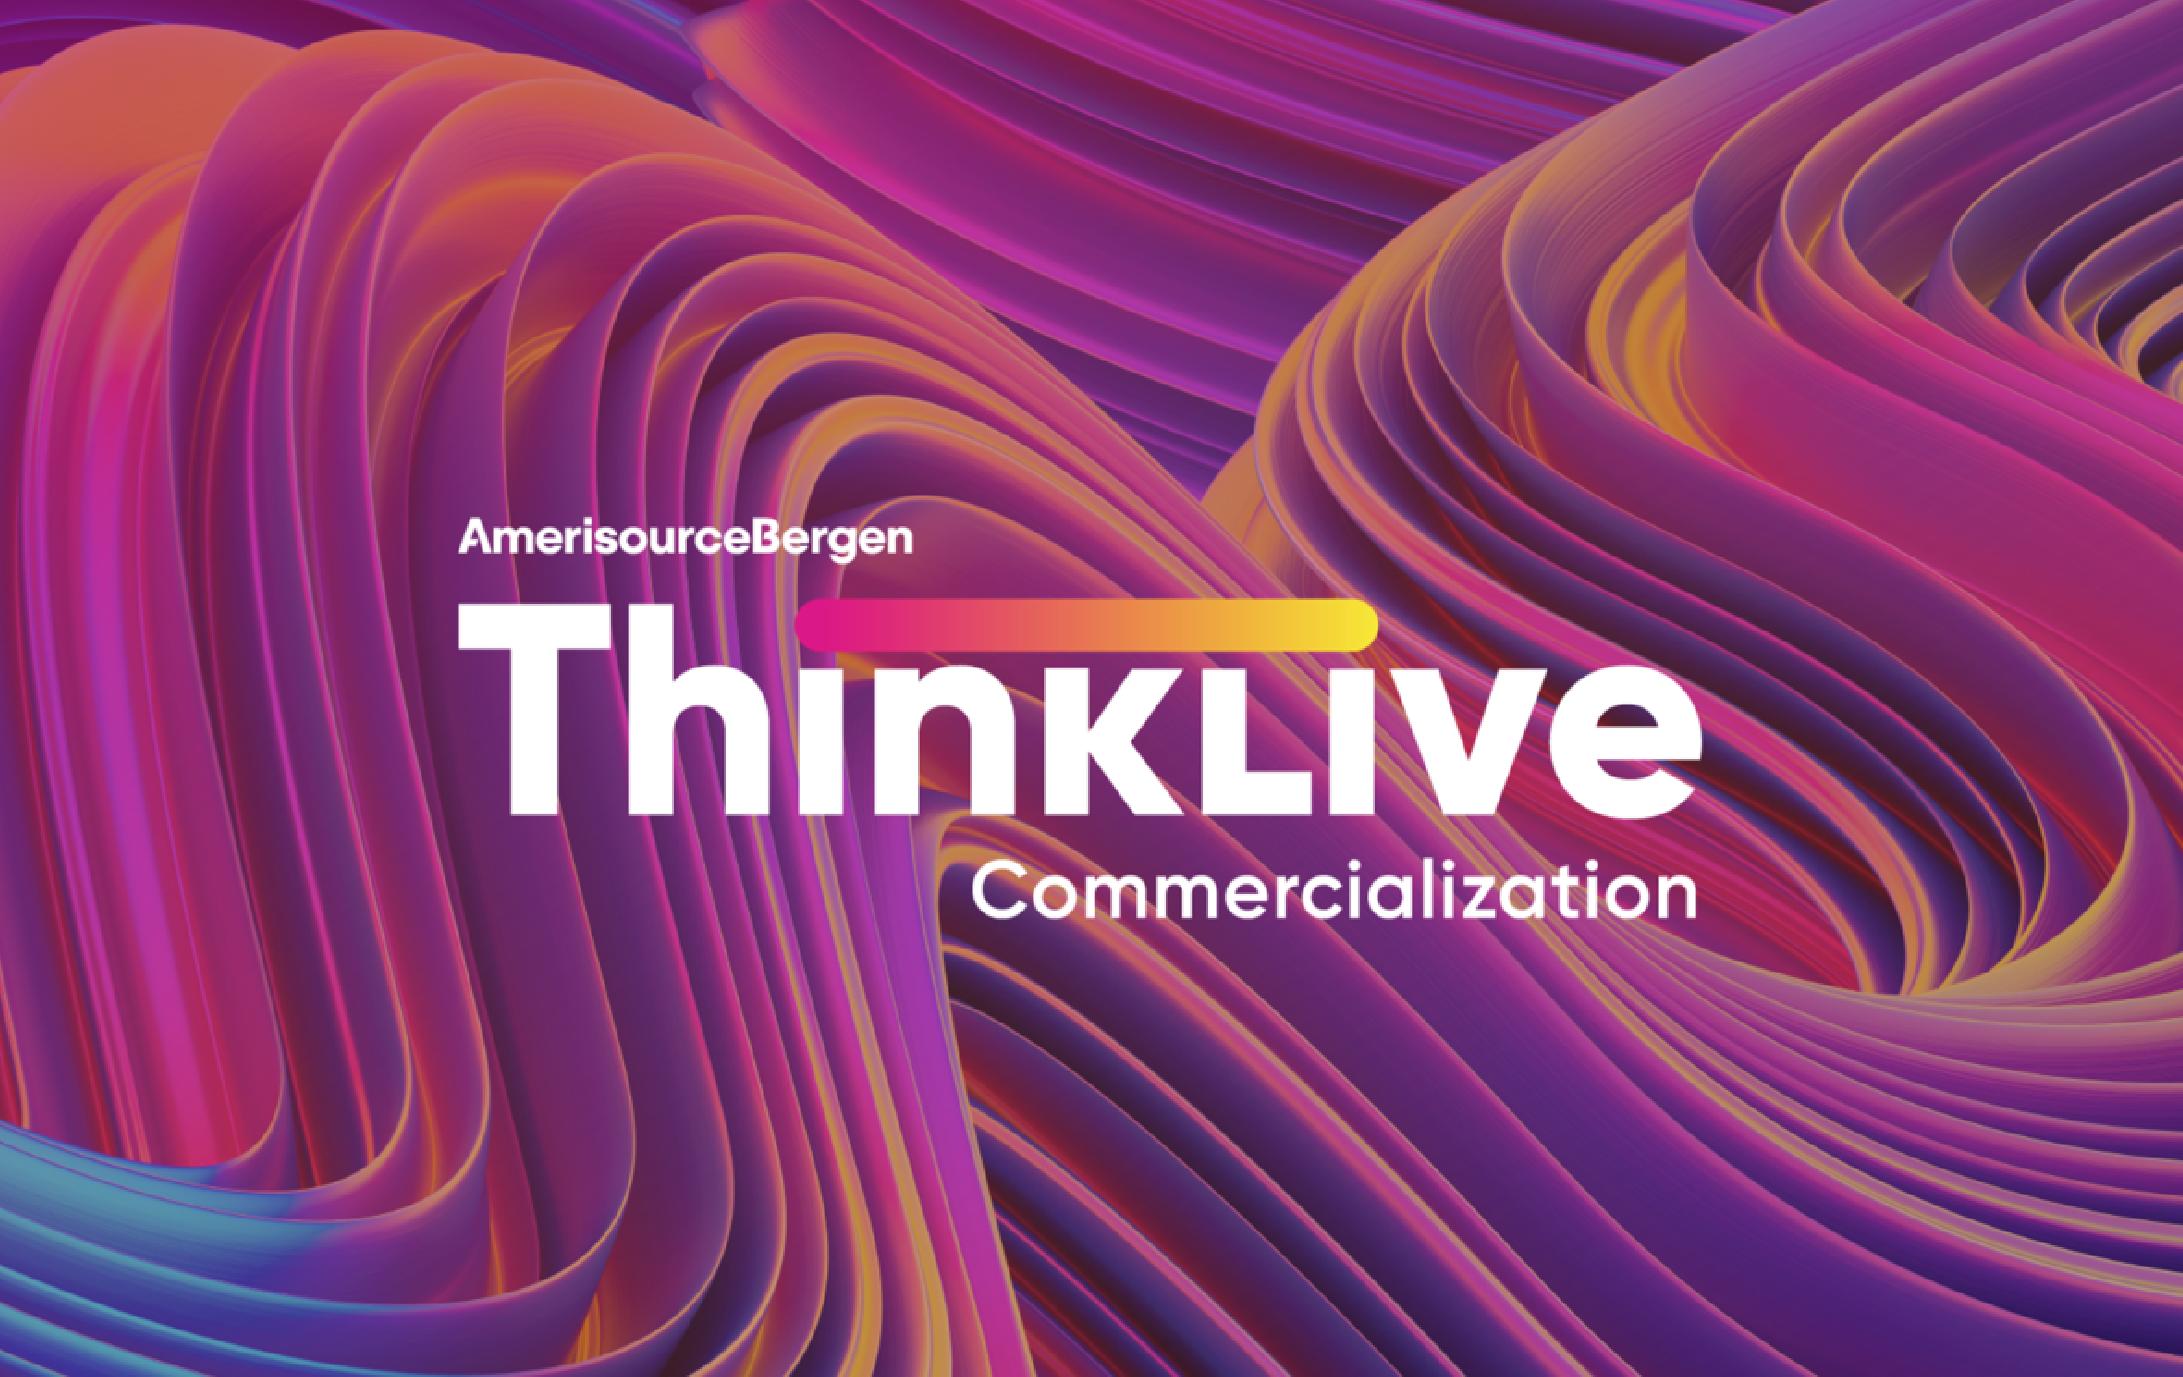 AmerisourceBergen ThinkLive Commercialization Portfolio Link